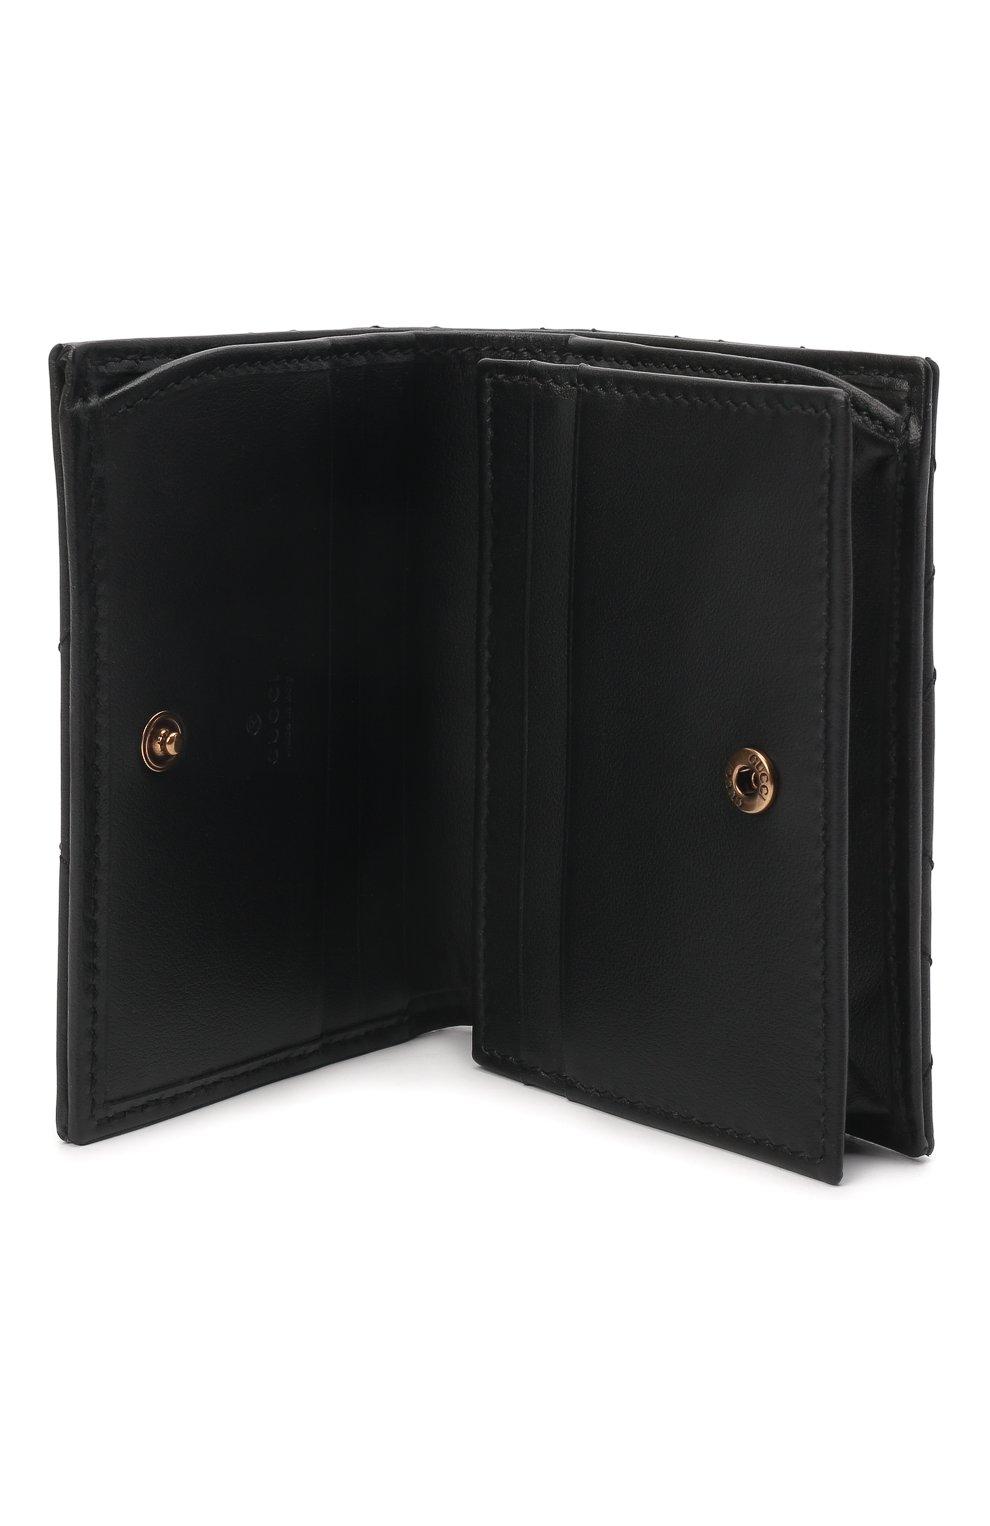 Кожаное портмоне GG Marmon Gucci черного цвета | Фото №3